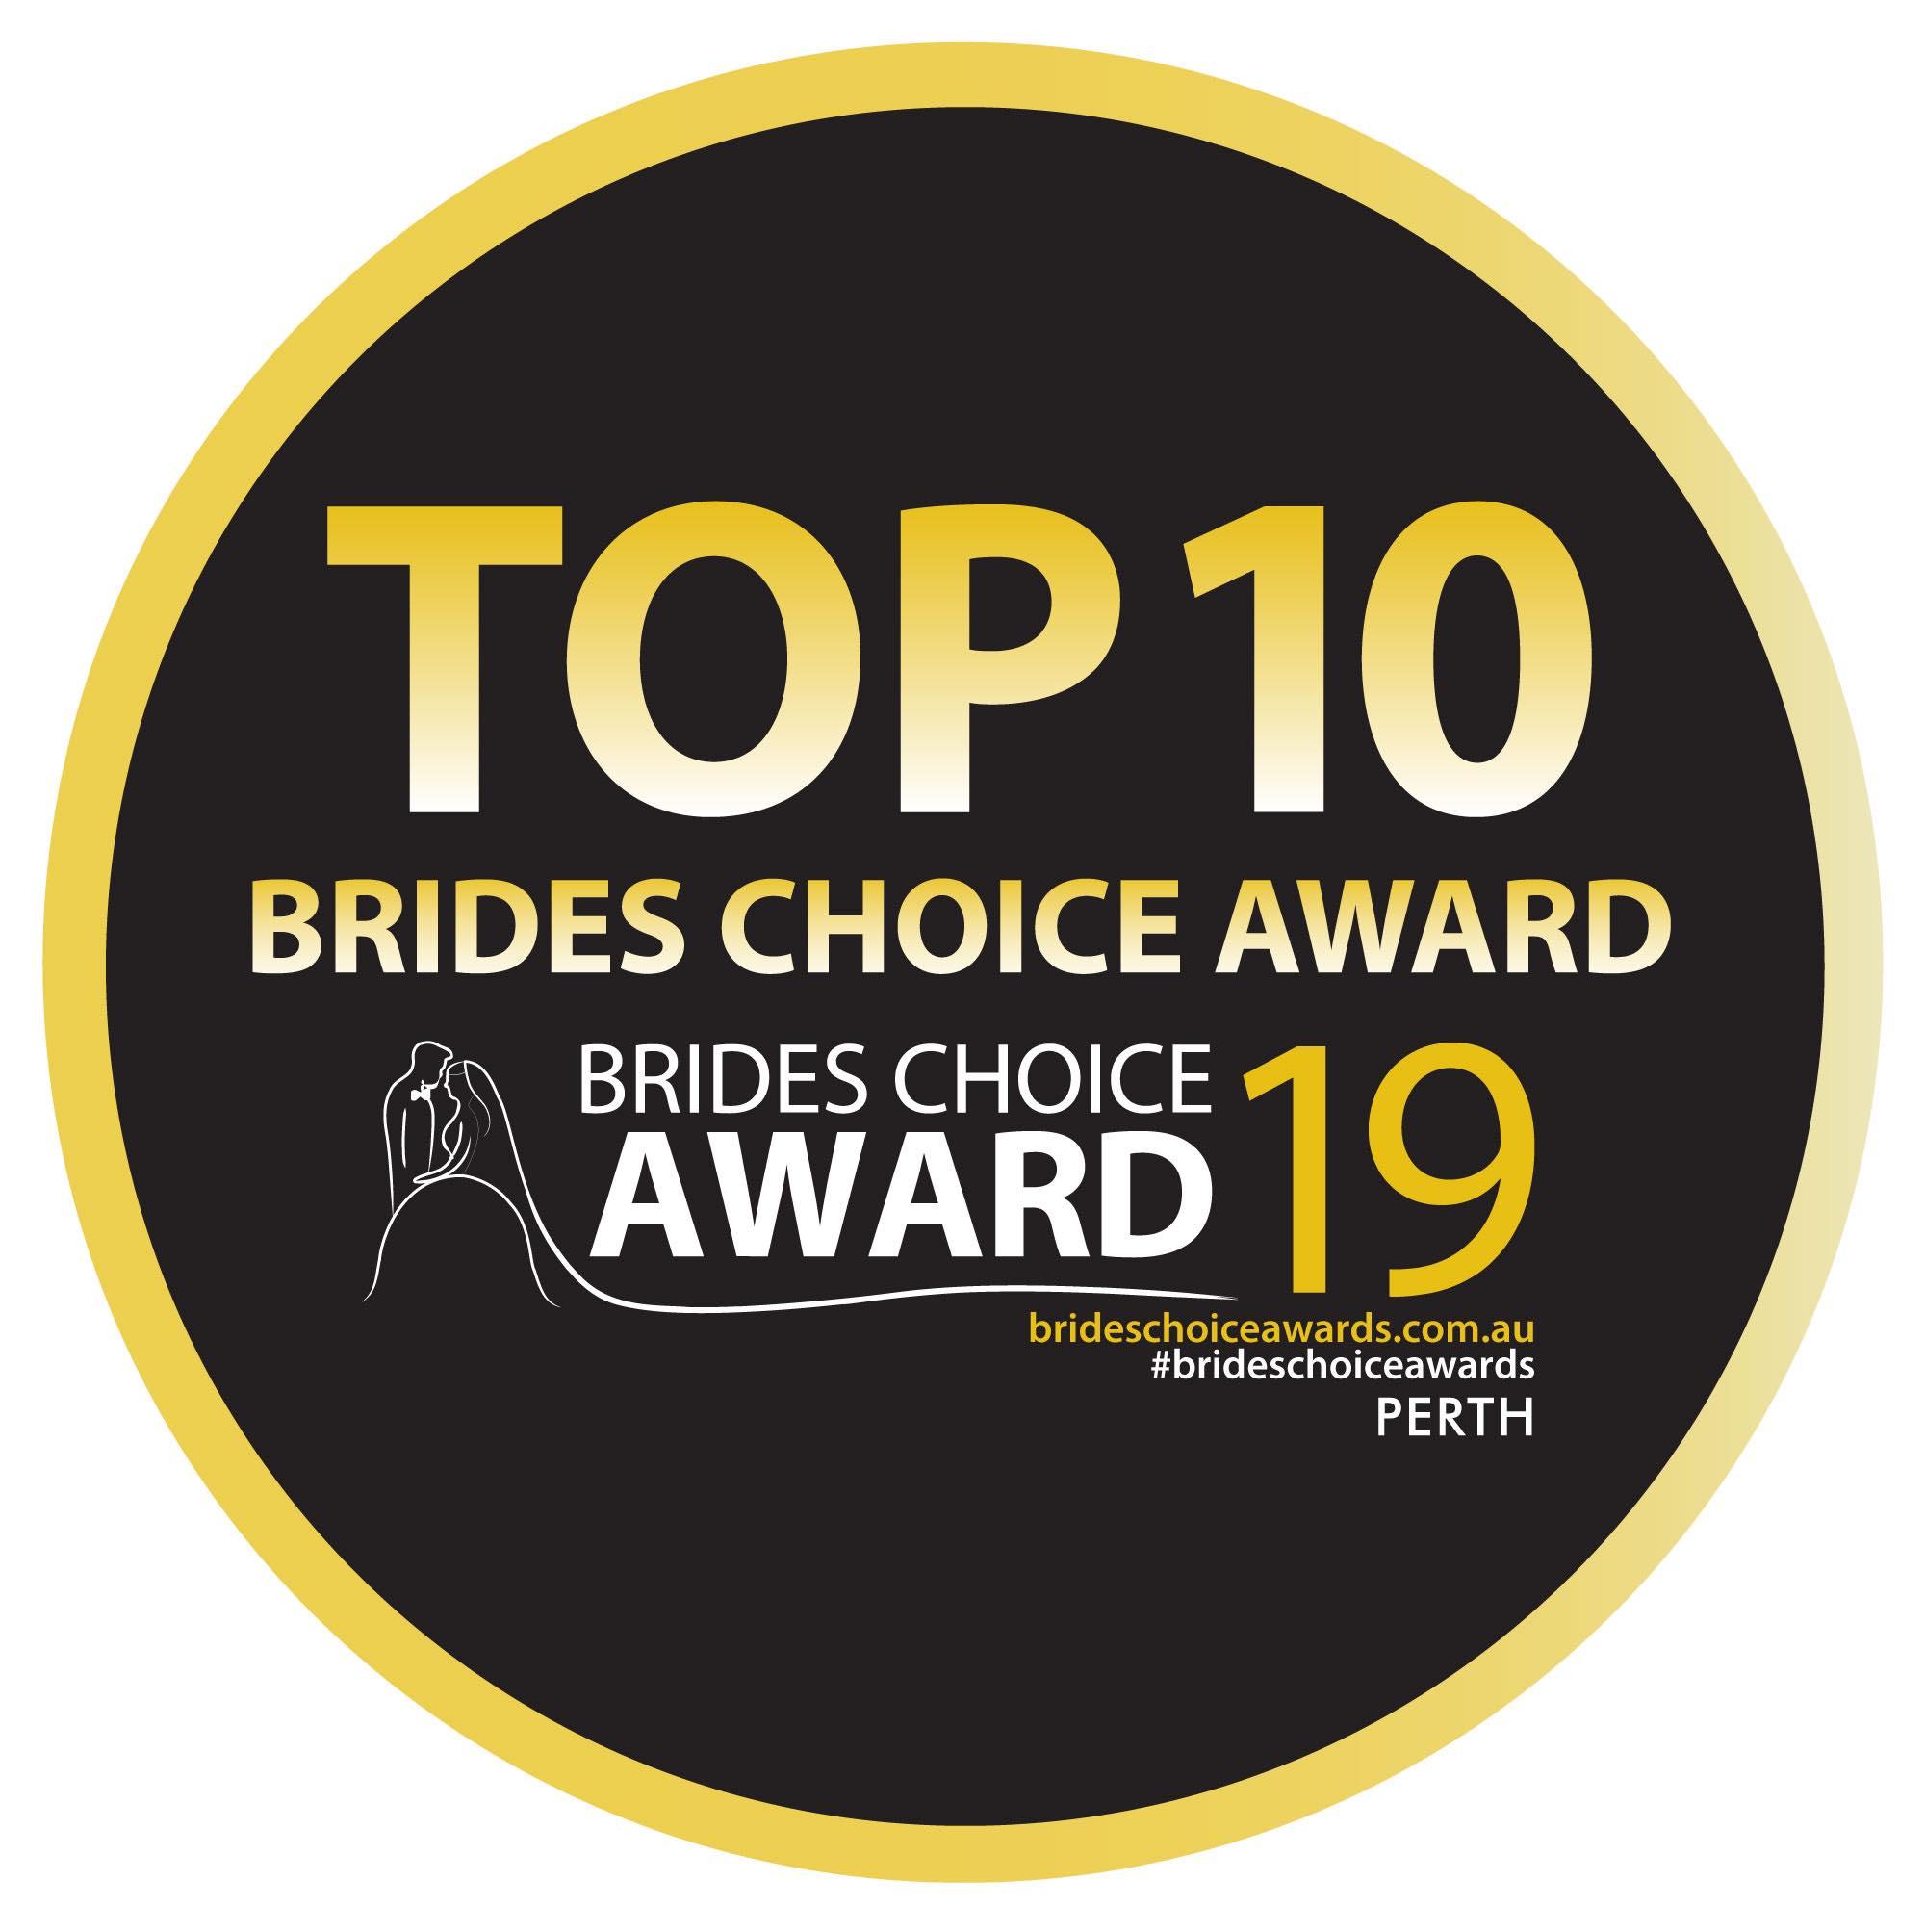 Brides choice award 2019